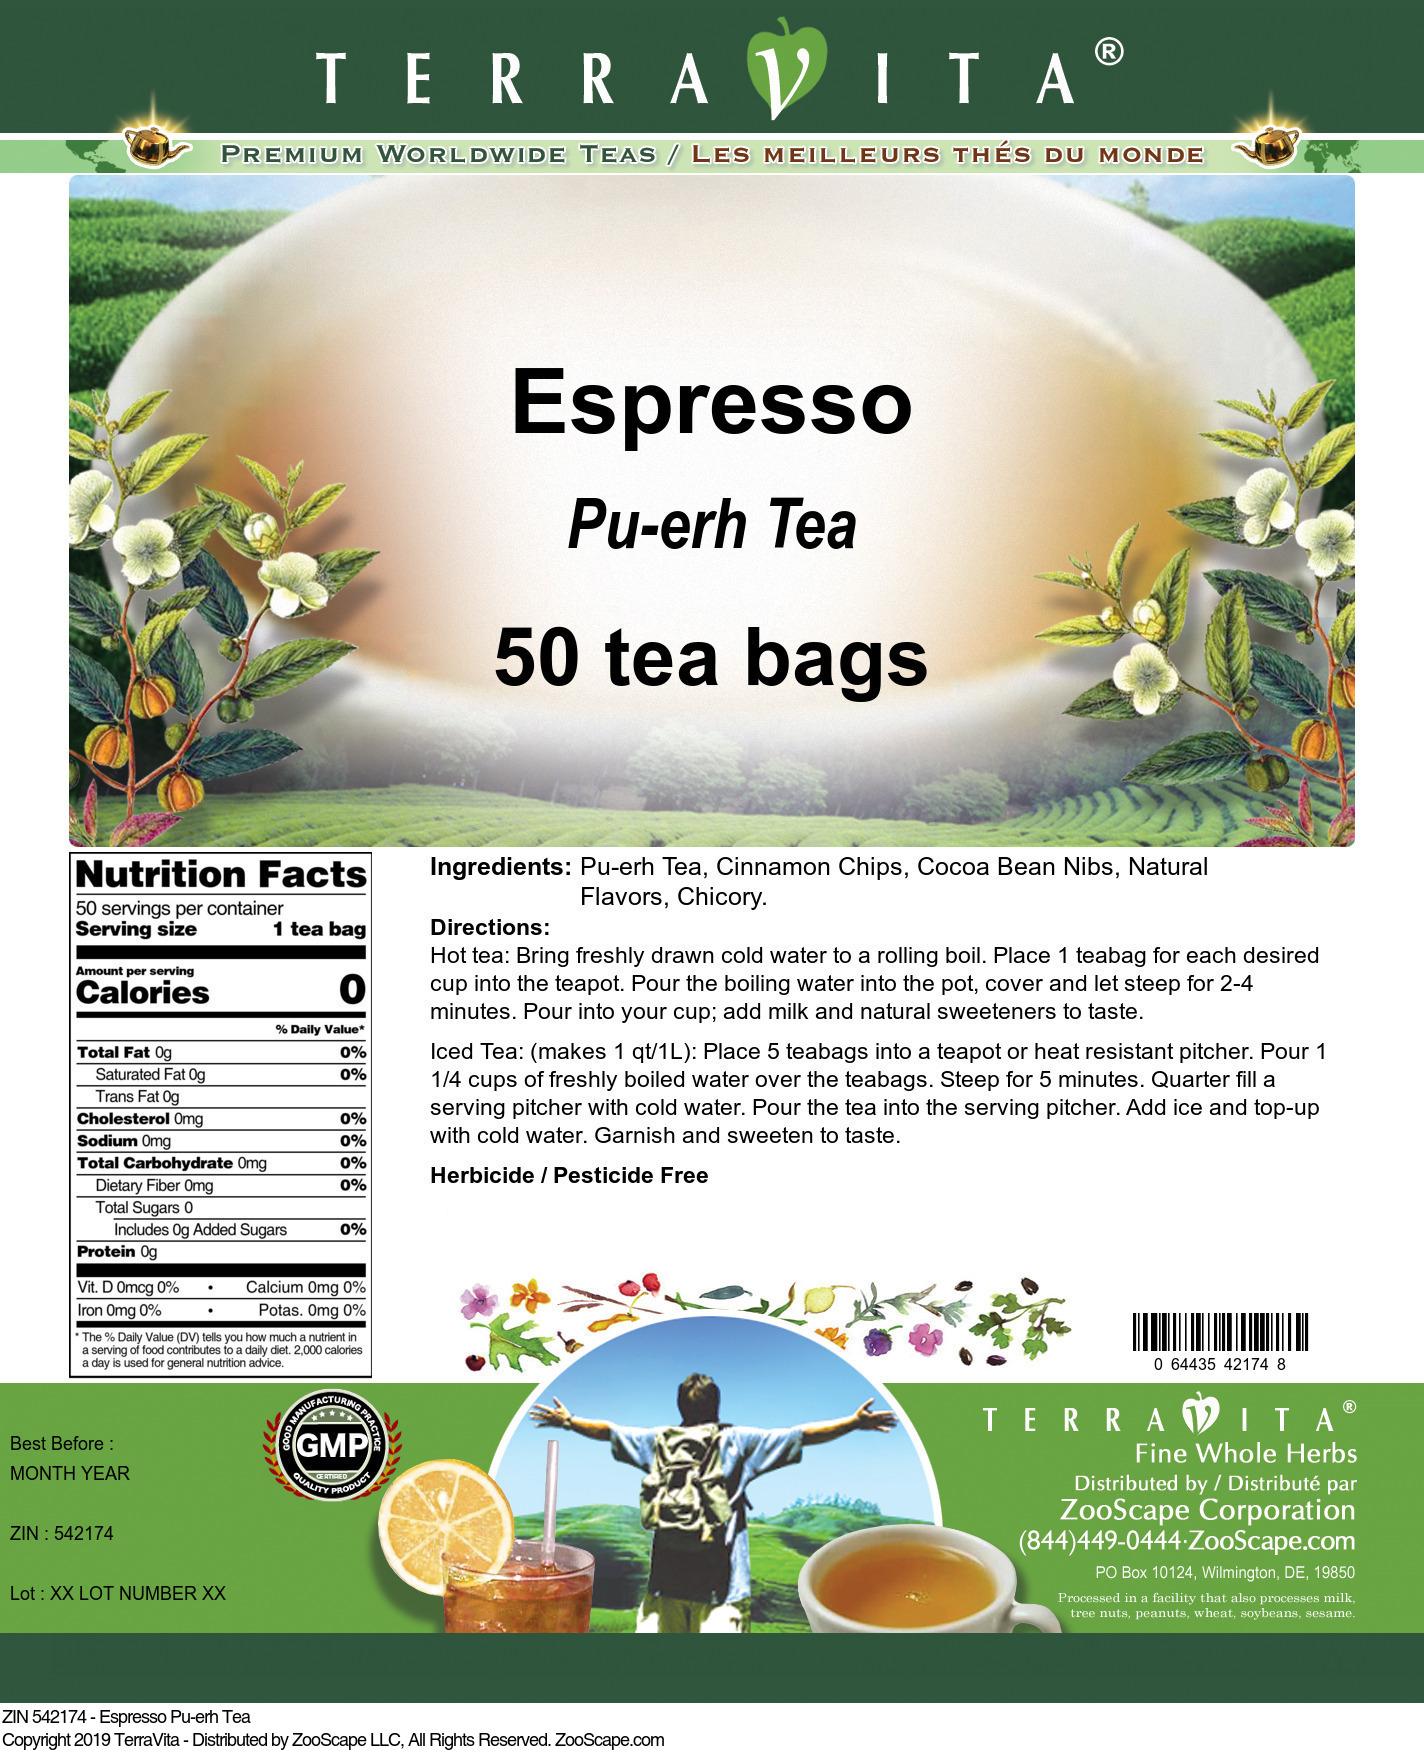 Espresso Pu-erh Tea